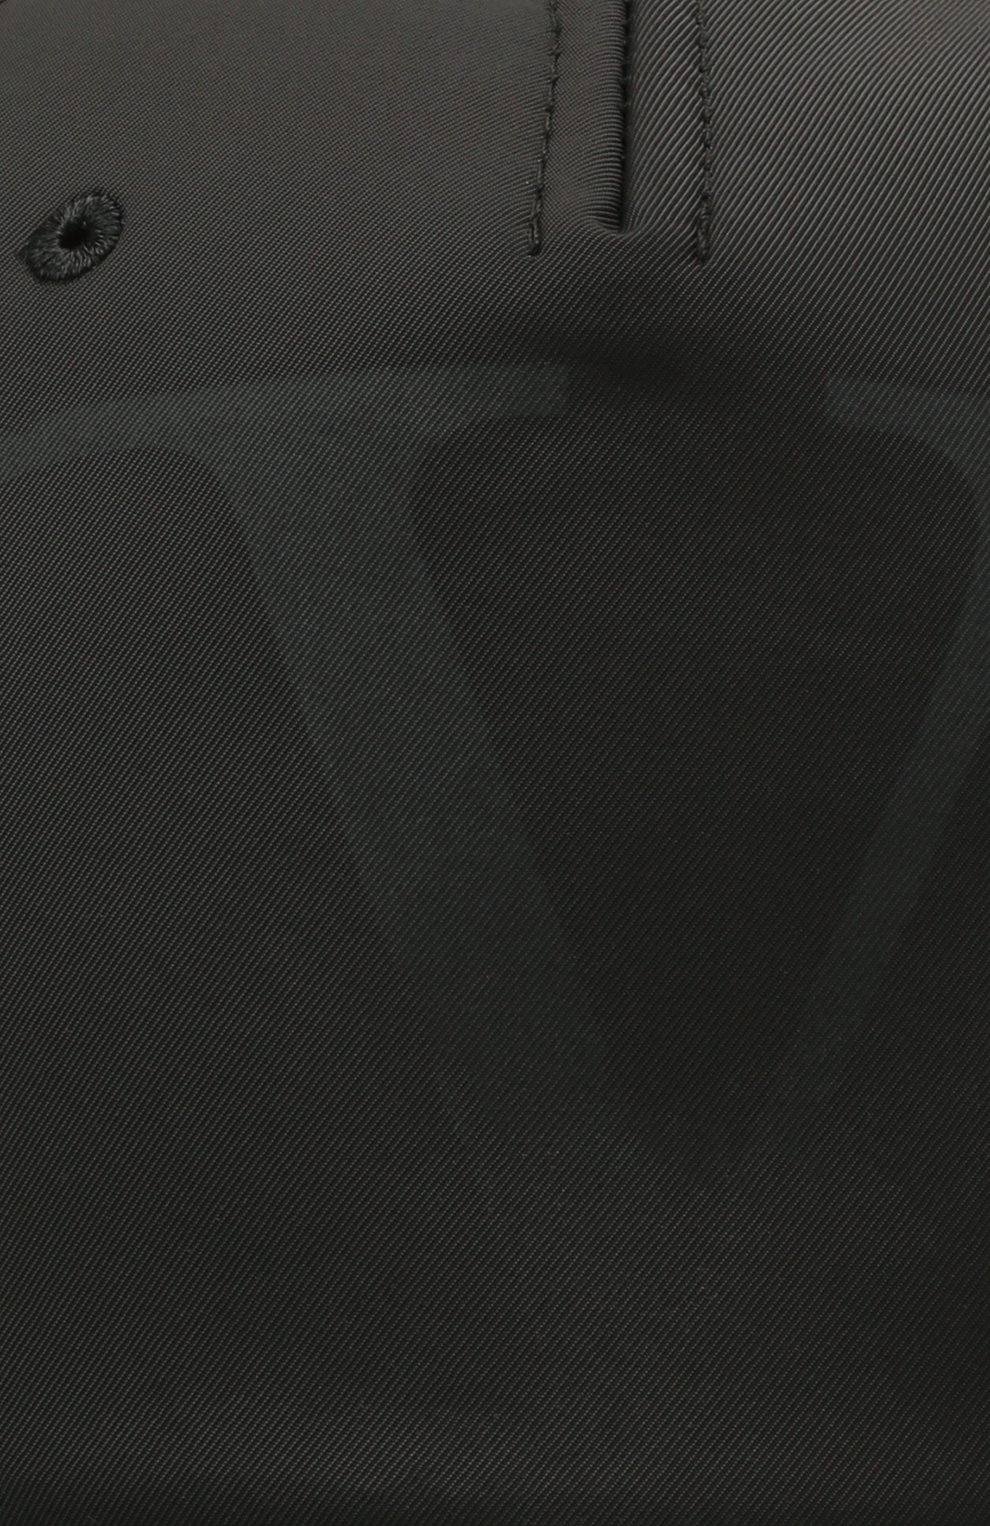 Мужской бейсболка valentino garavani VALENTINO черного цвета, арт. VY2HDA10/EWJ | Фото 3